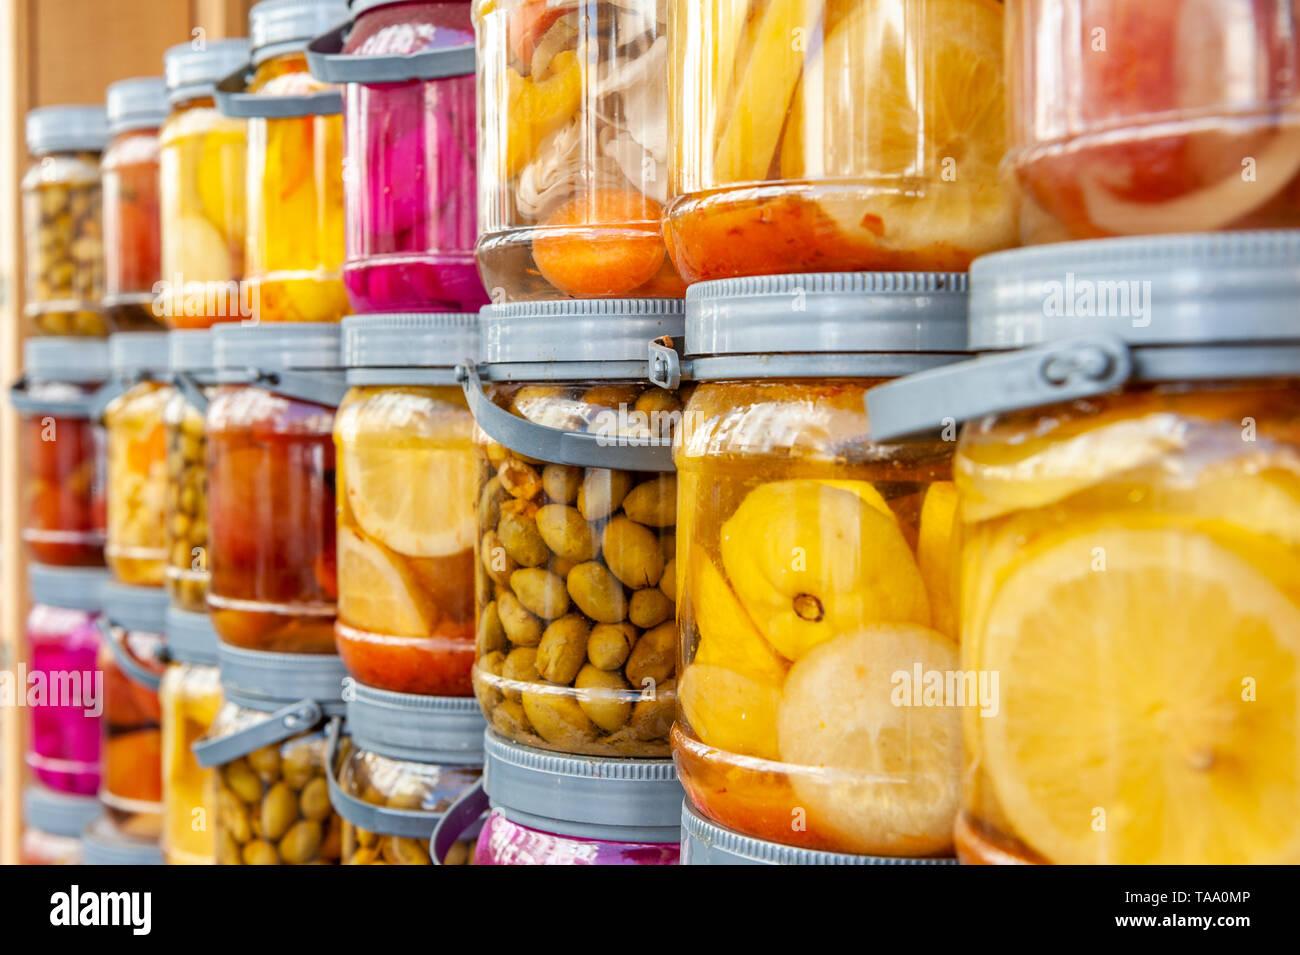 Israel, Tel Aviv-Yafo - 17 May 2019: Shuk levinsky market: preserves, Tel Aviv, Israel - Stock Image